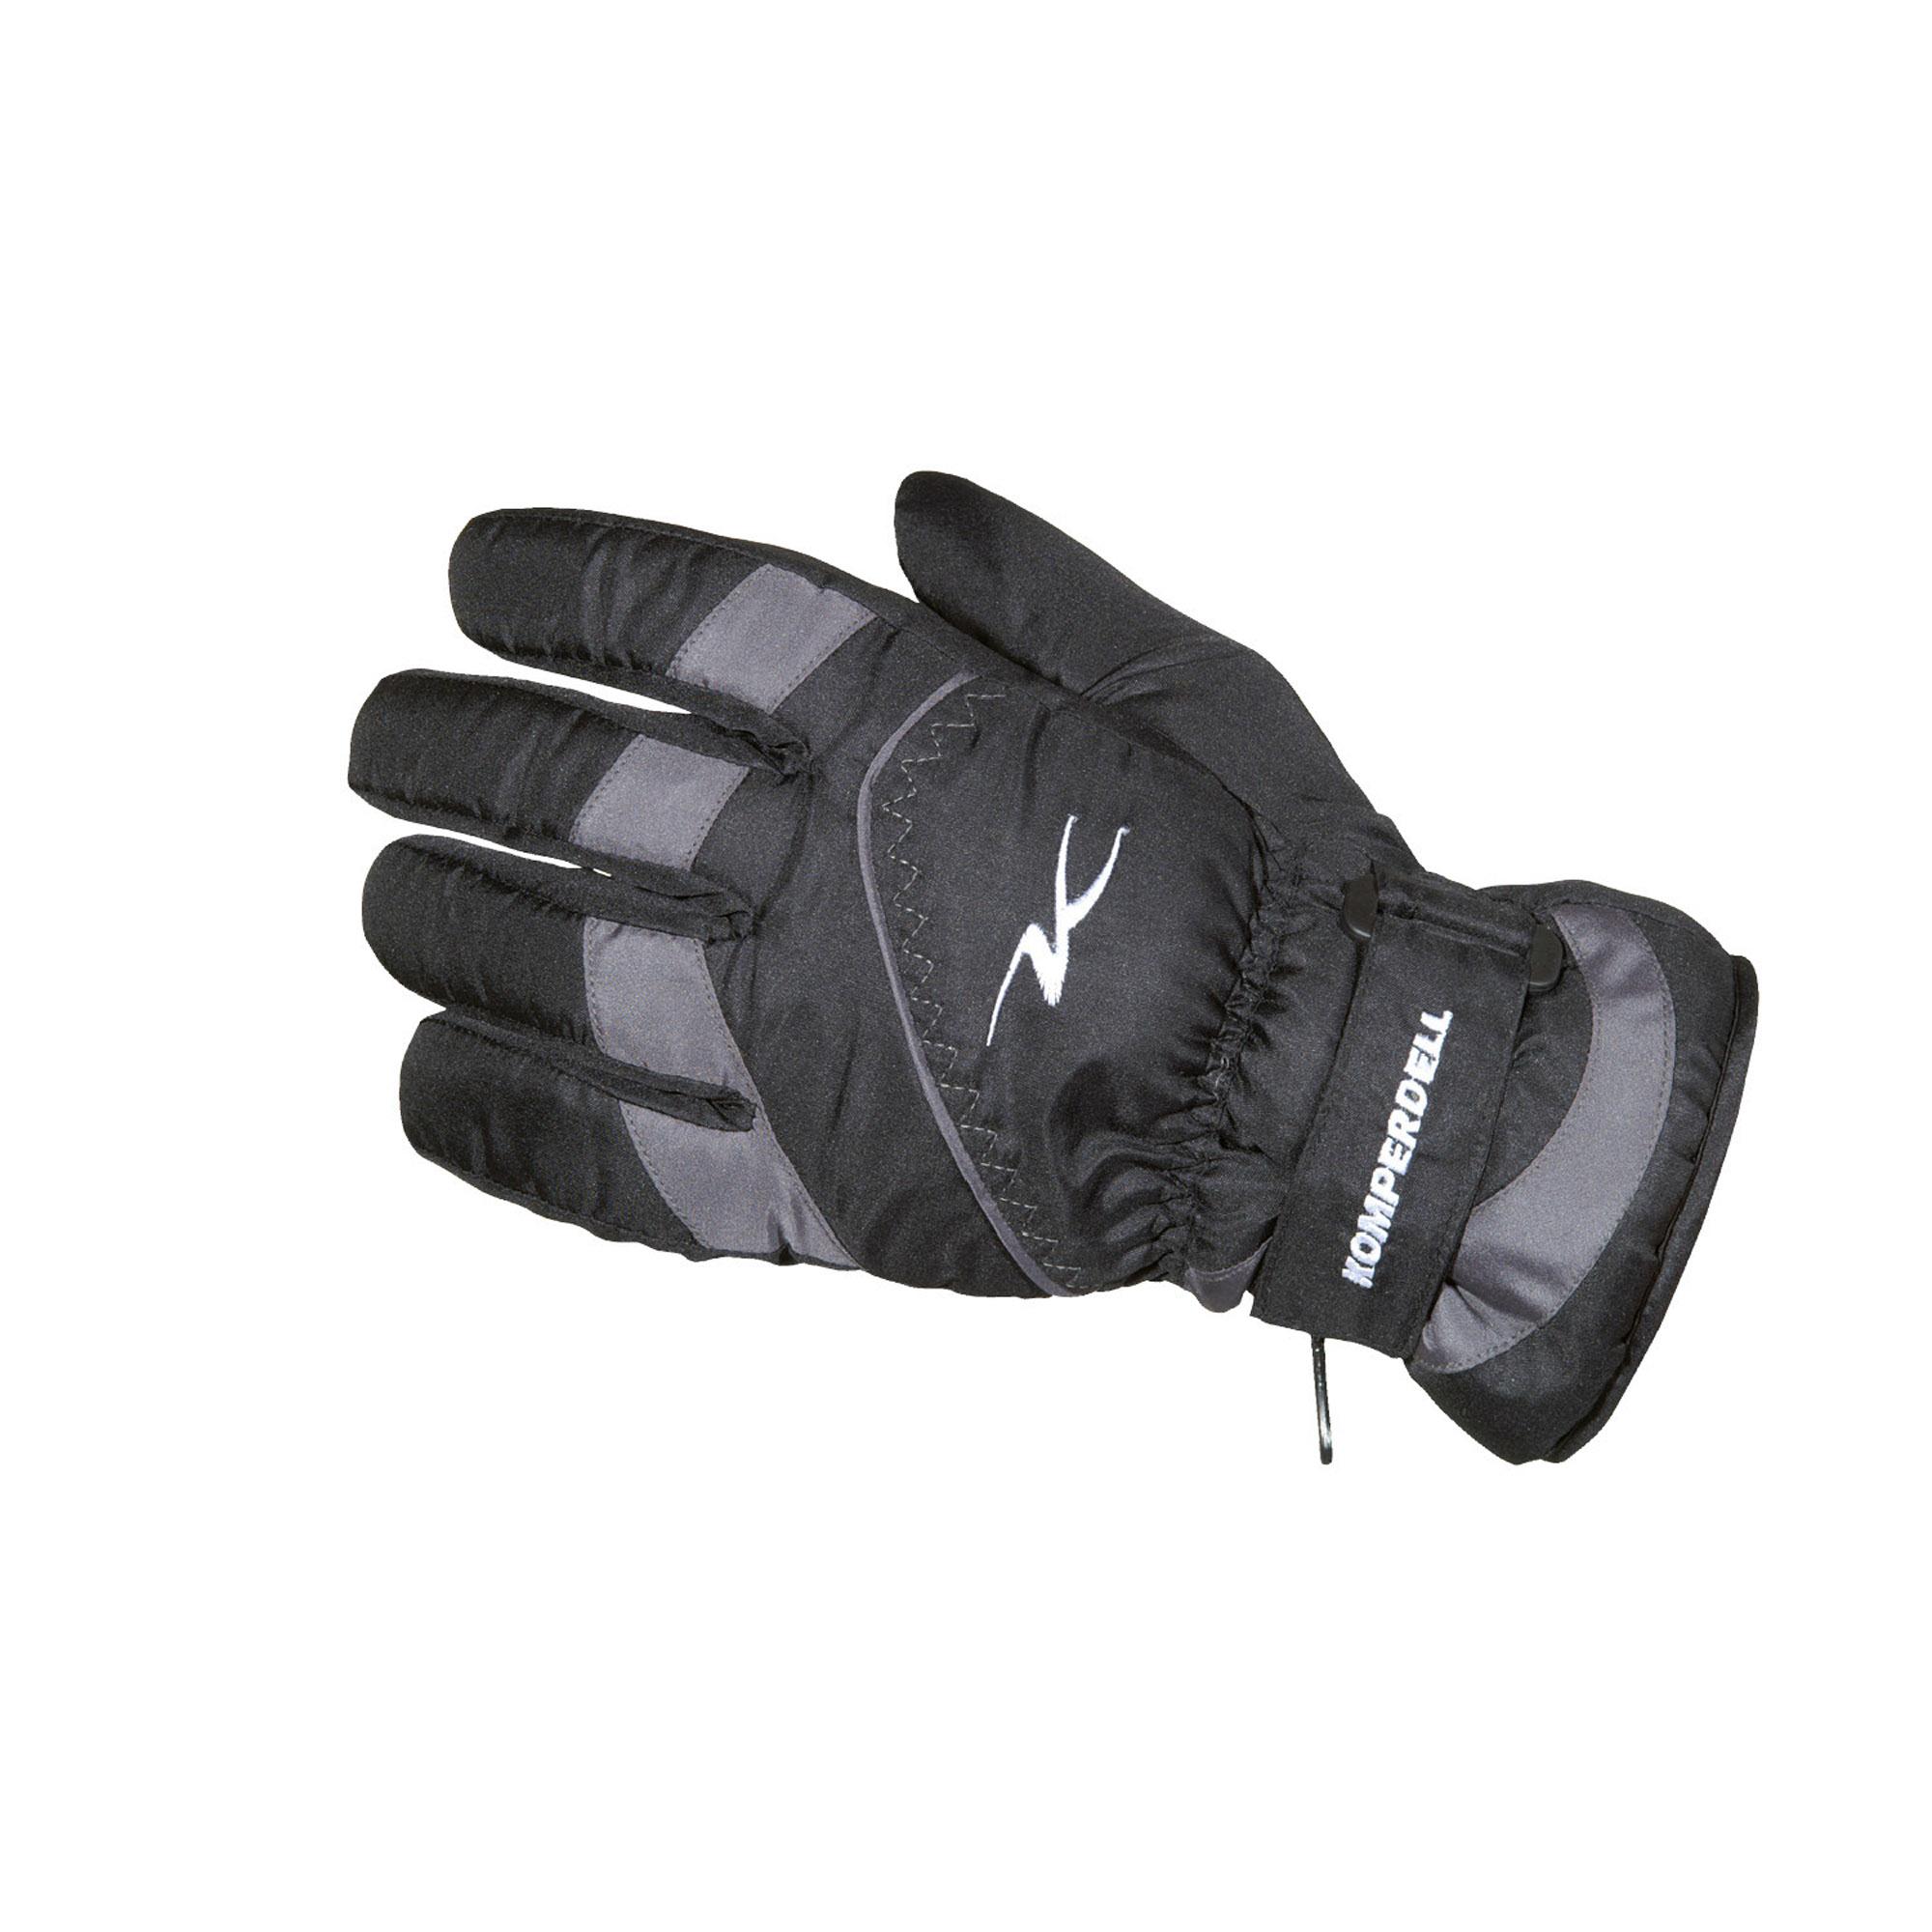 Komperdell Mountain Handschuh